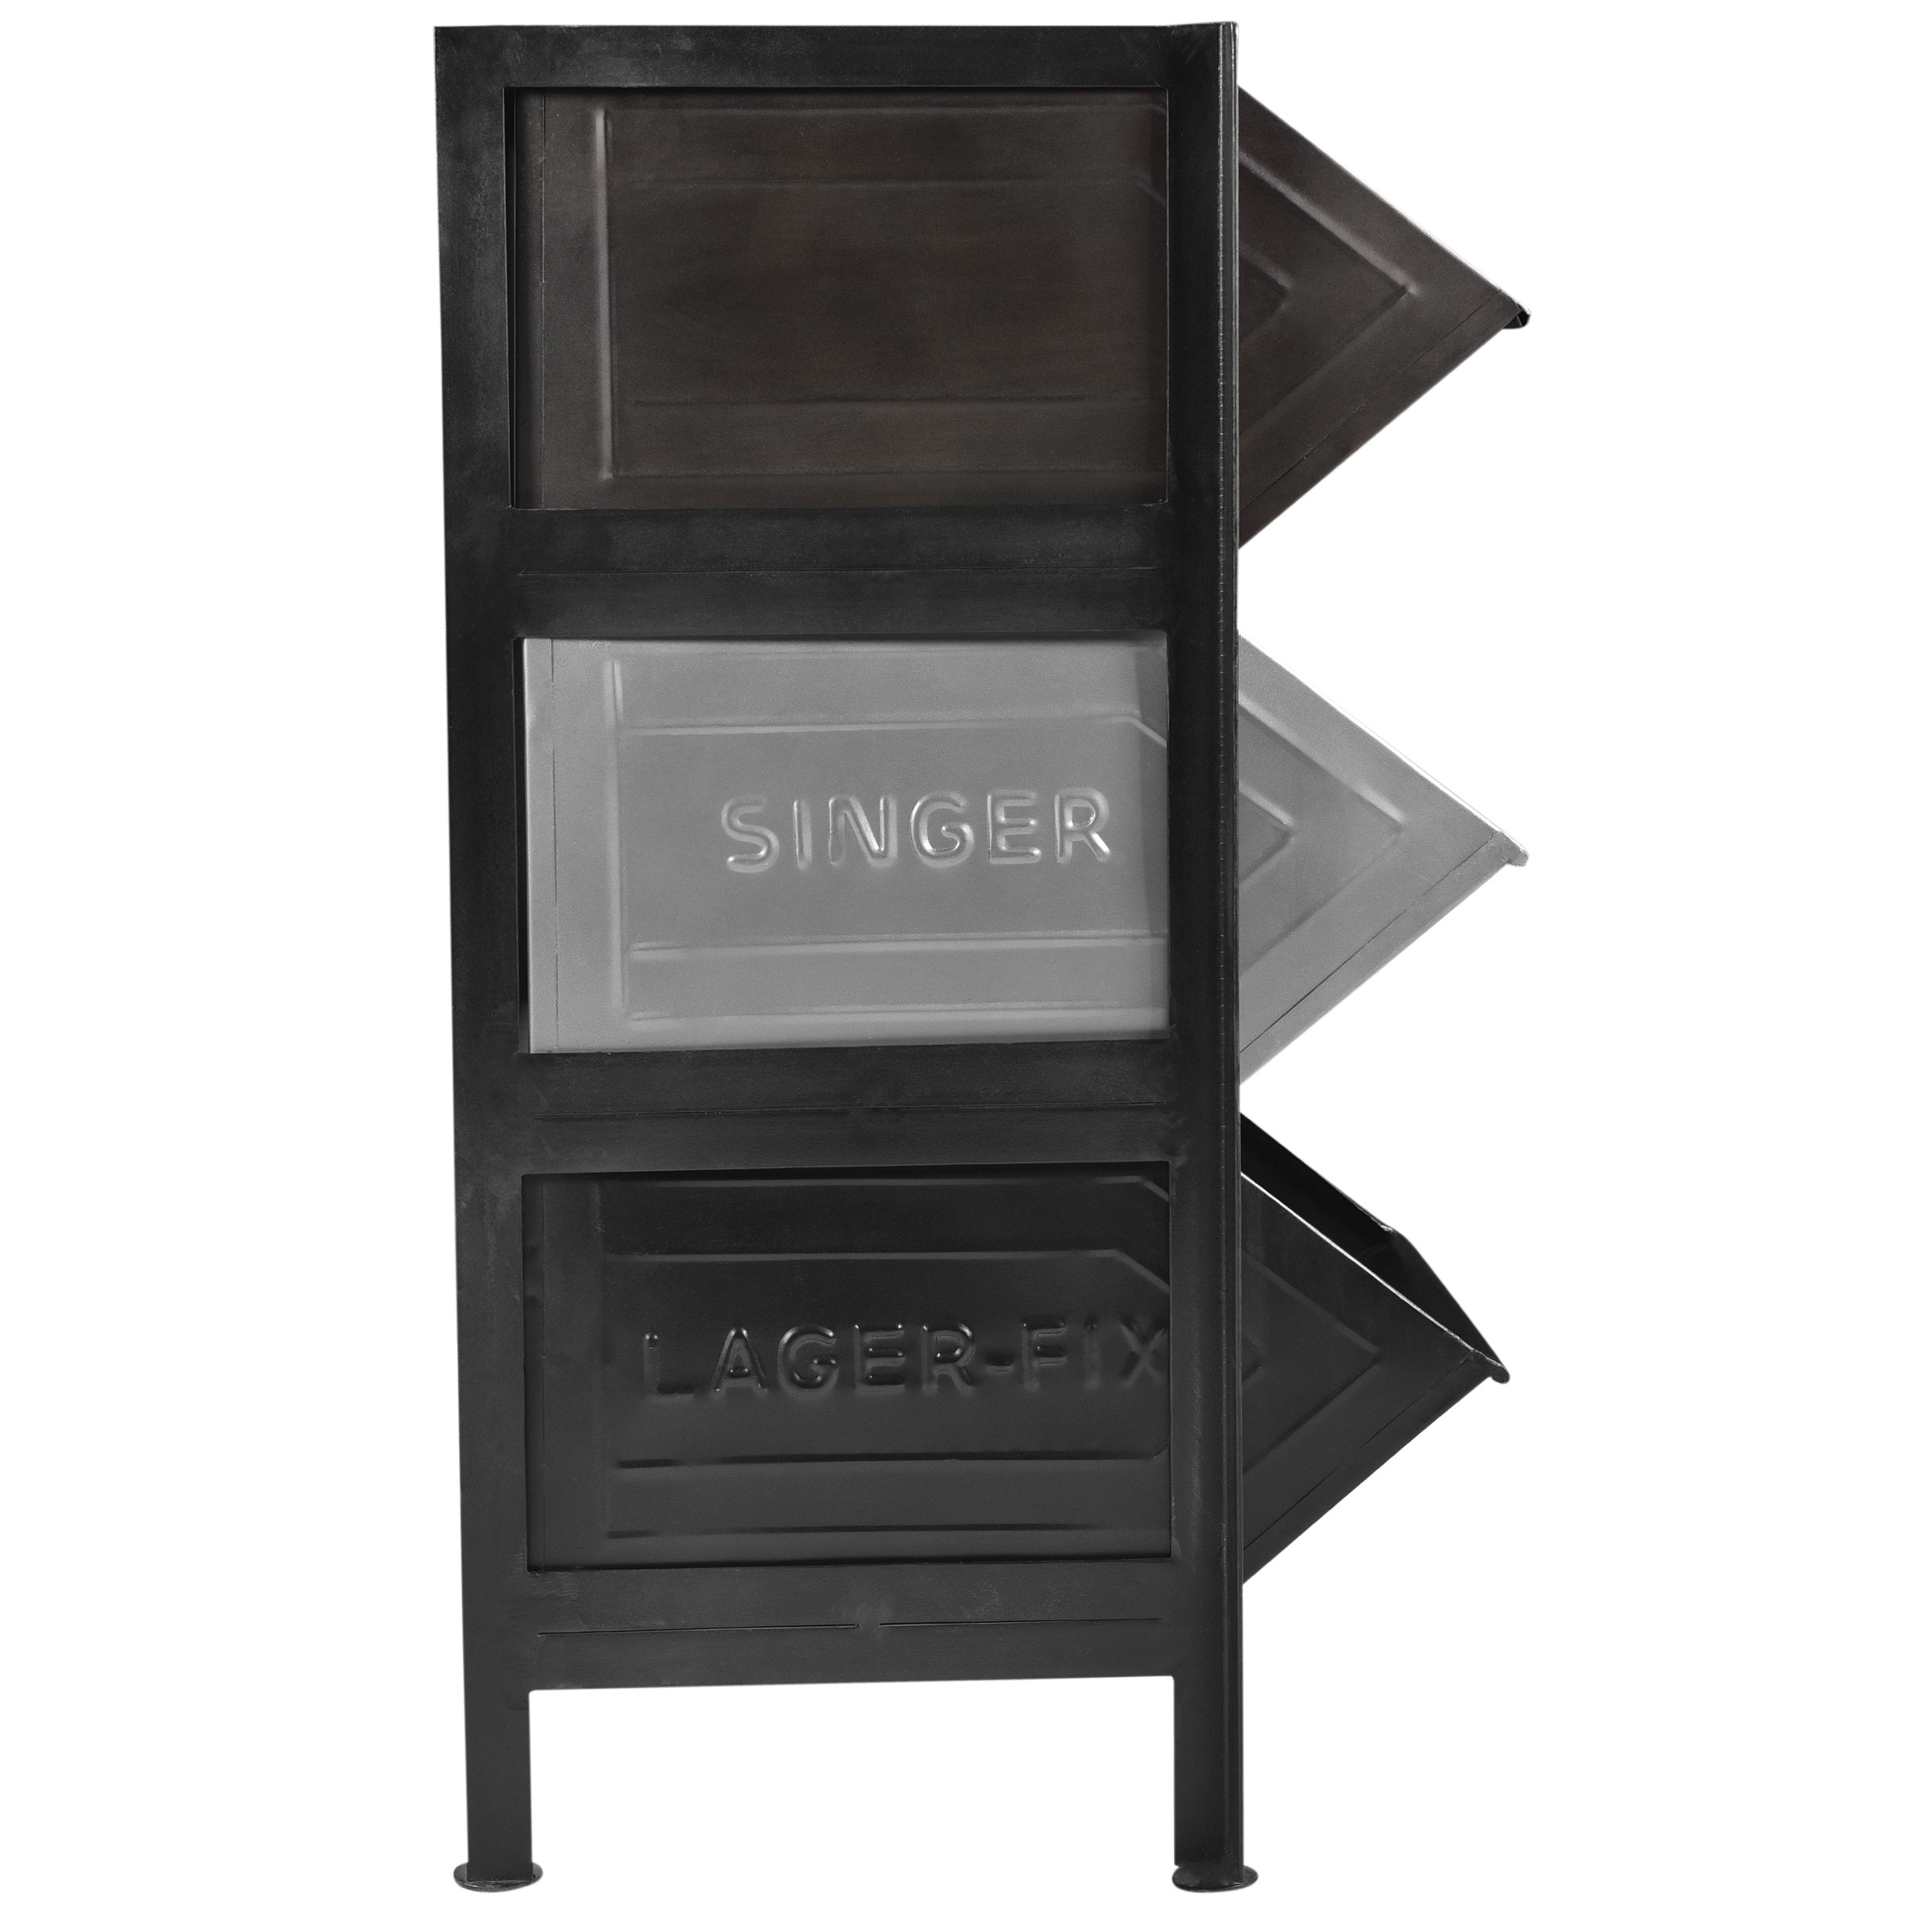 commode madras 3 casiers commandez les commodes madras 3 casiers design rdv d co. Black Bedroom Furniture Sets. Home Design Ideas